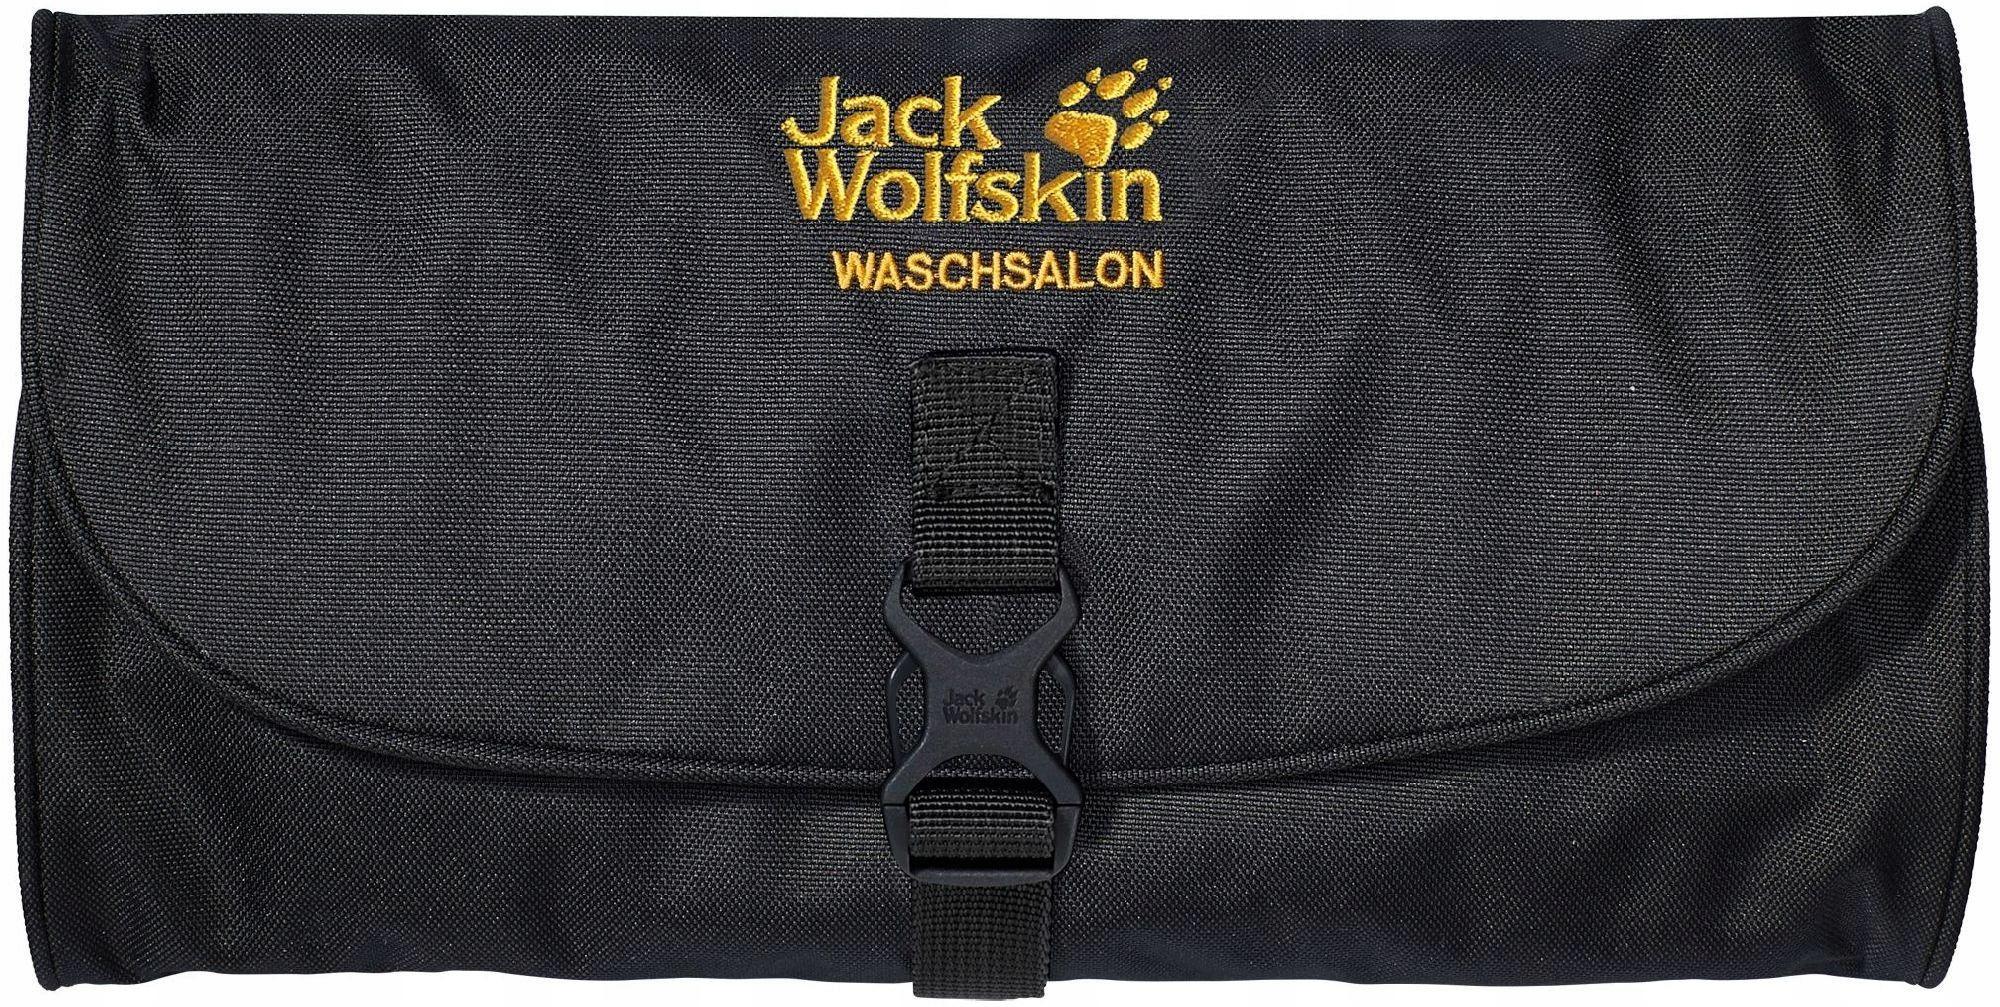 Jack Wolfskin Kosmetyczka Waschsalon Black